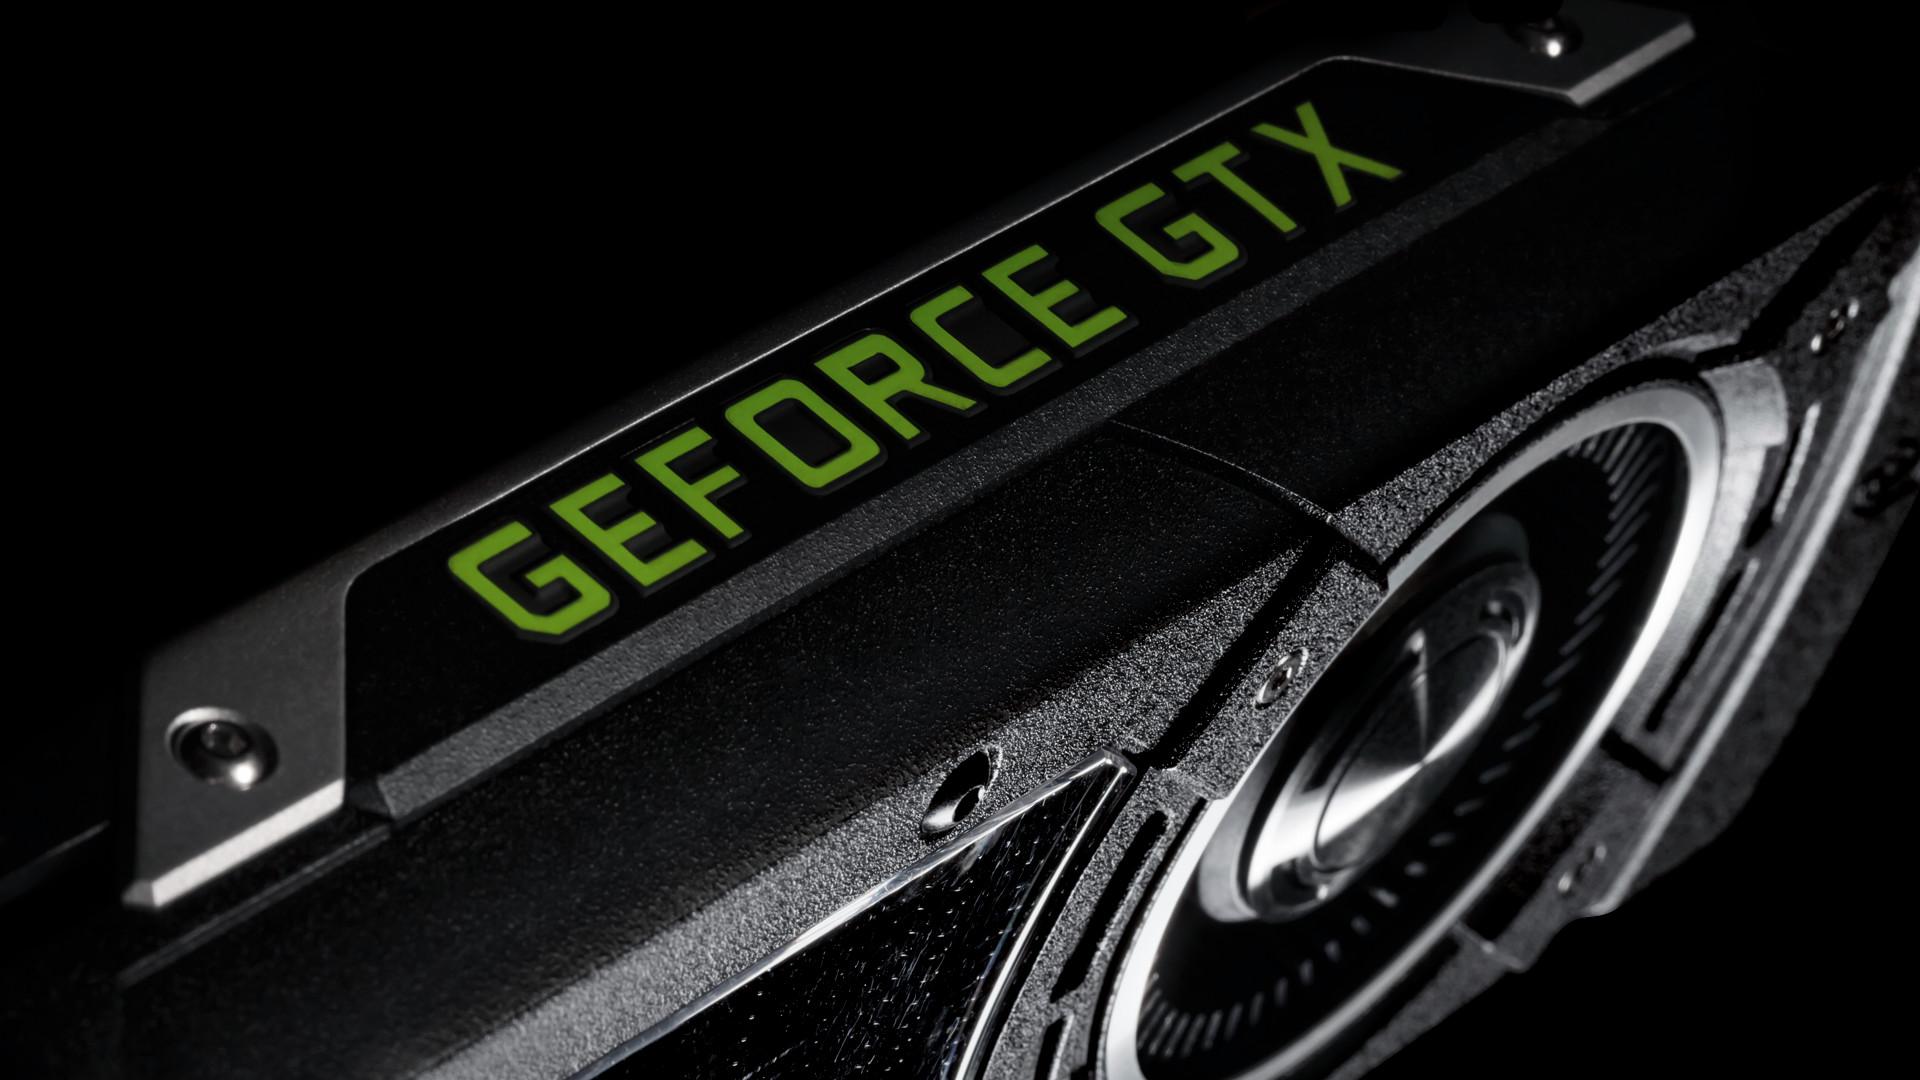 EVGA GeForce GTX TITAN Wallpaper – EVGA Forums